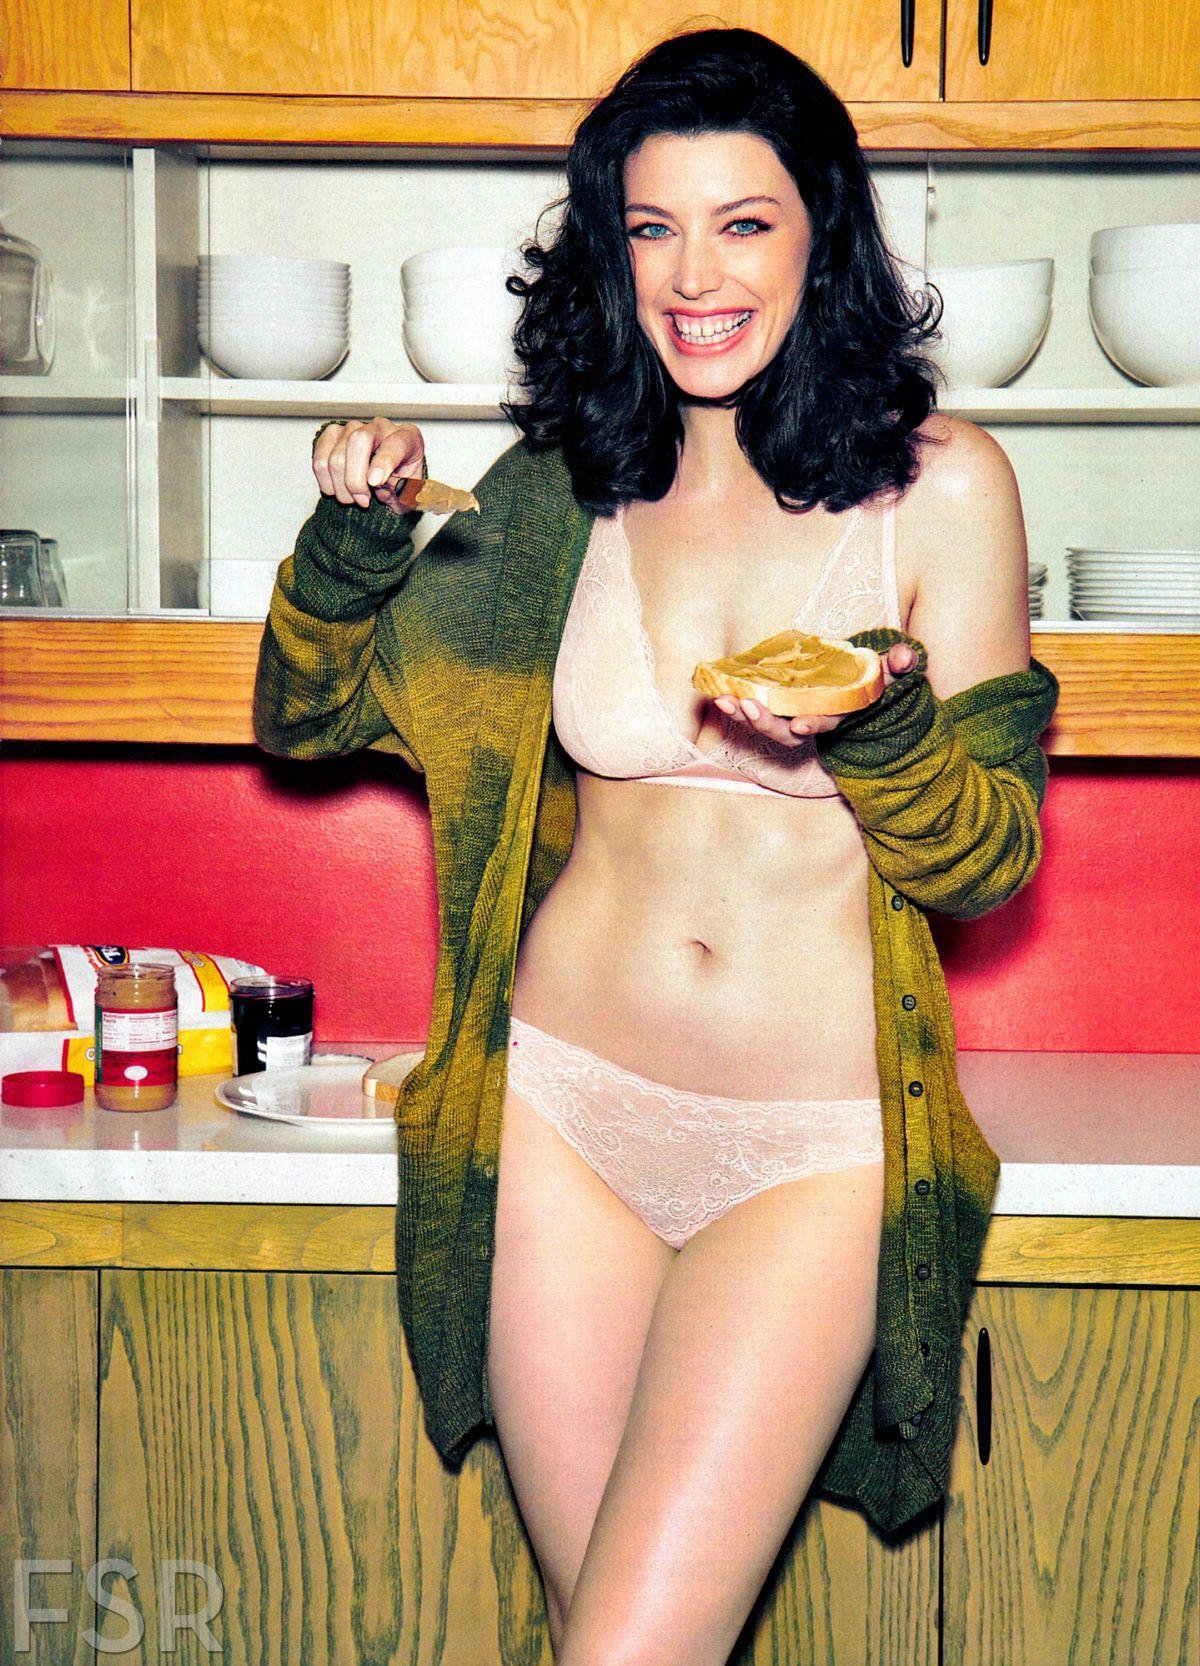 JESSICA PARE in Esquire Magazine, April 2014 Issue